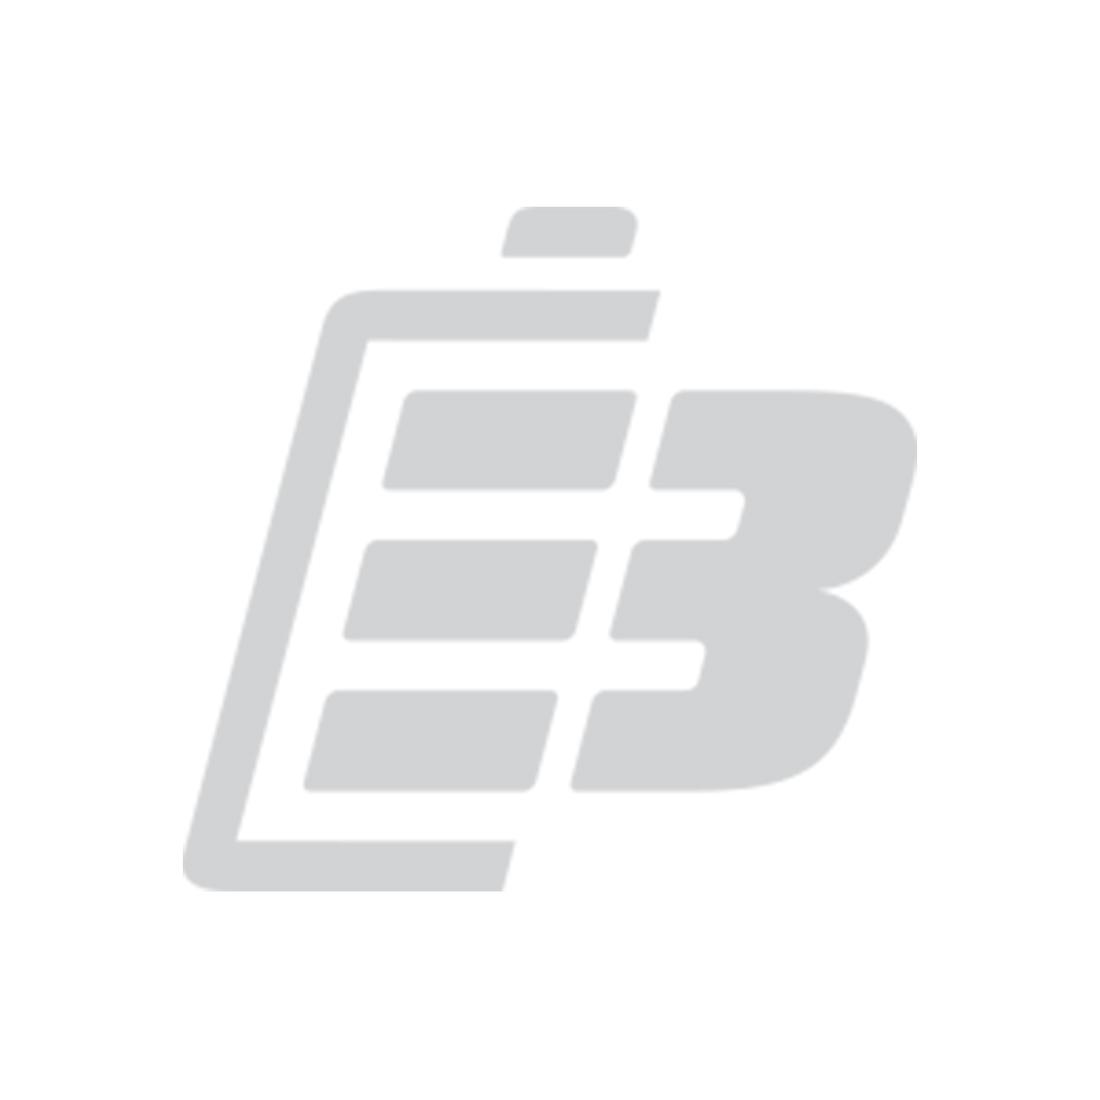 Cordless phone battery Bang & Olufsen Beocom 6000_1